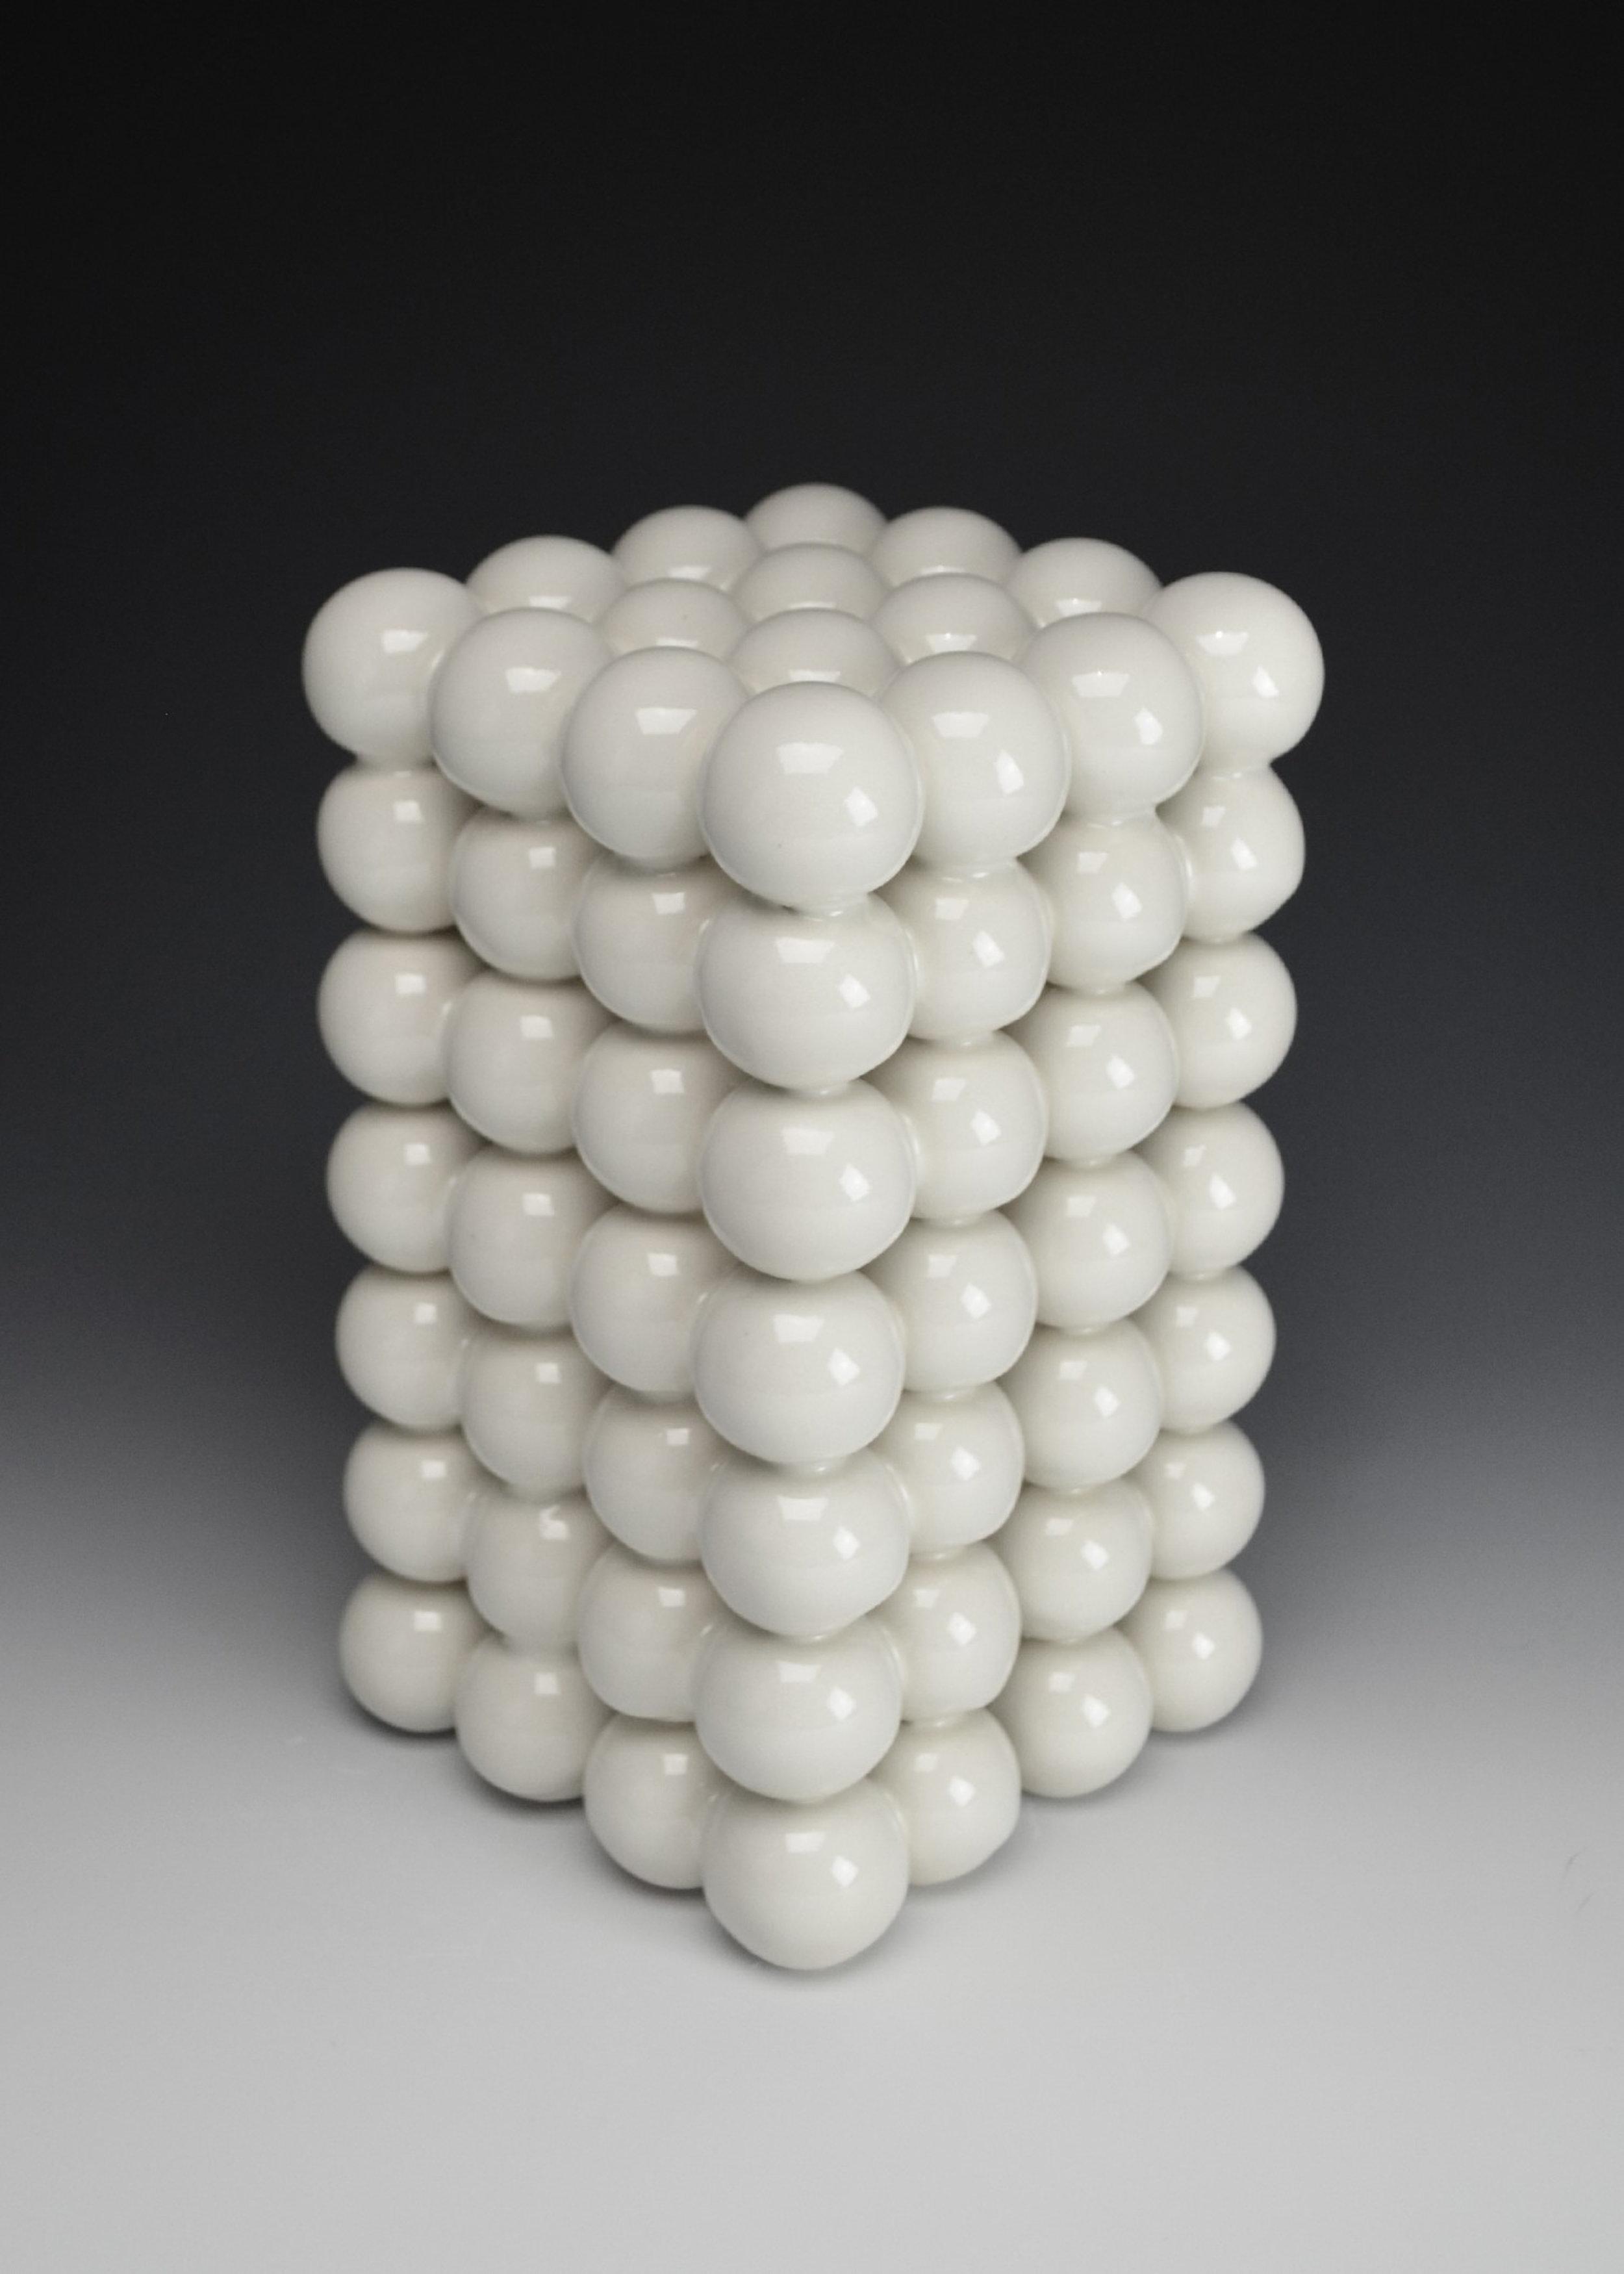 Ionic Series: Construction VII  |  9.5 x 5.5 x 5.5 inches  |  Porcelain, Glaze  |  2017